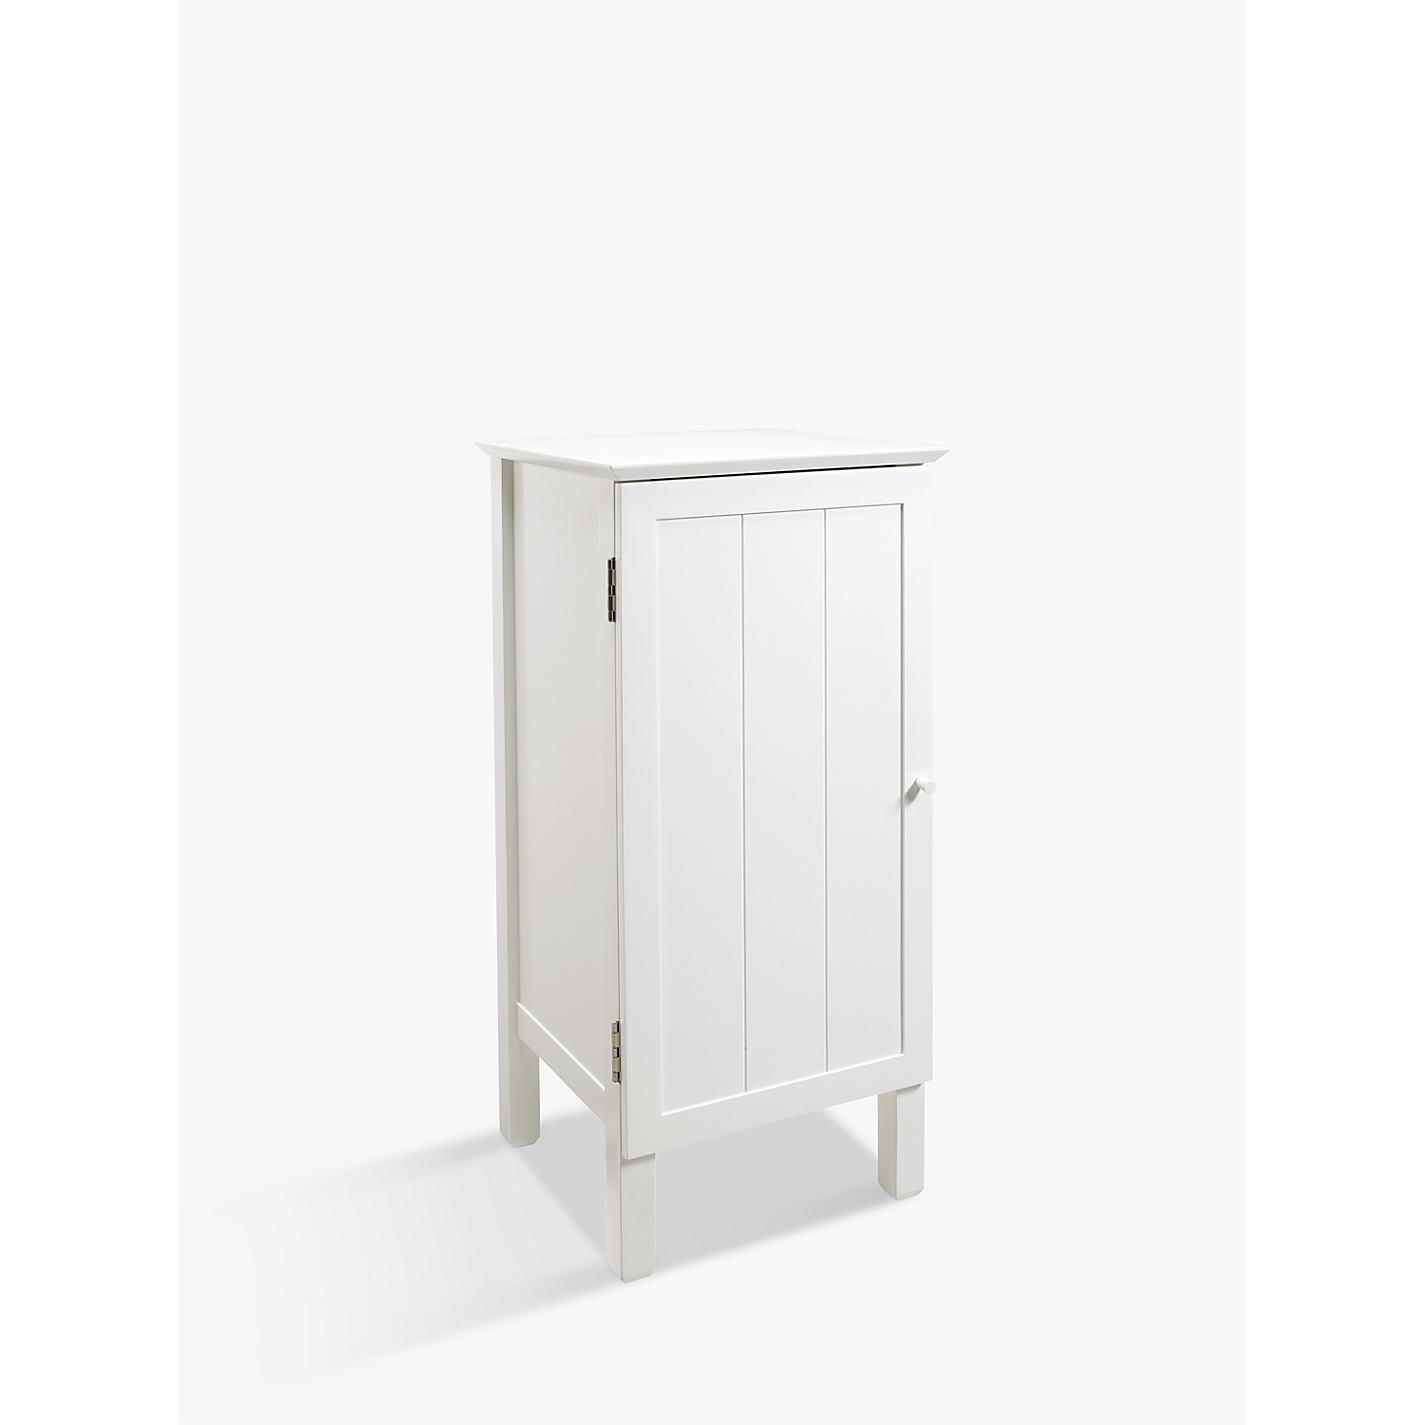 White Bathroom Cupboard Ikea Design Your Own Bedroom